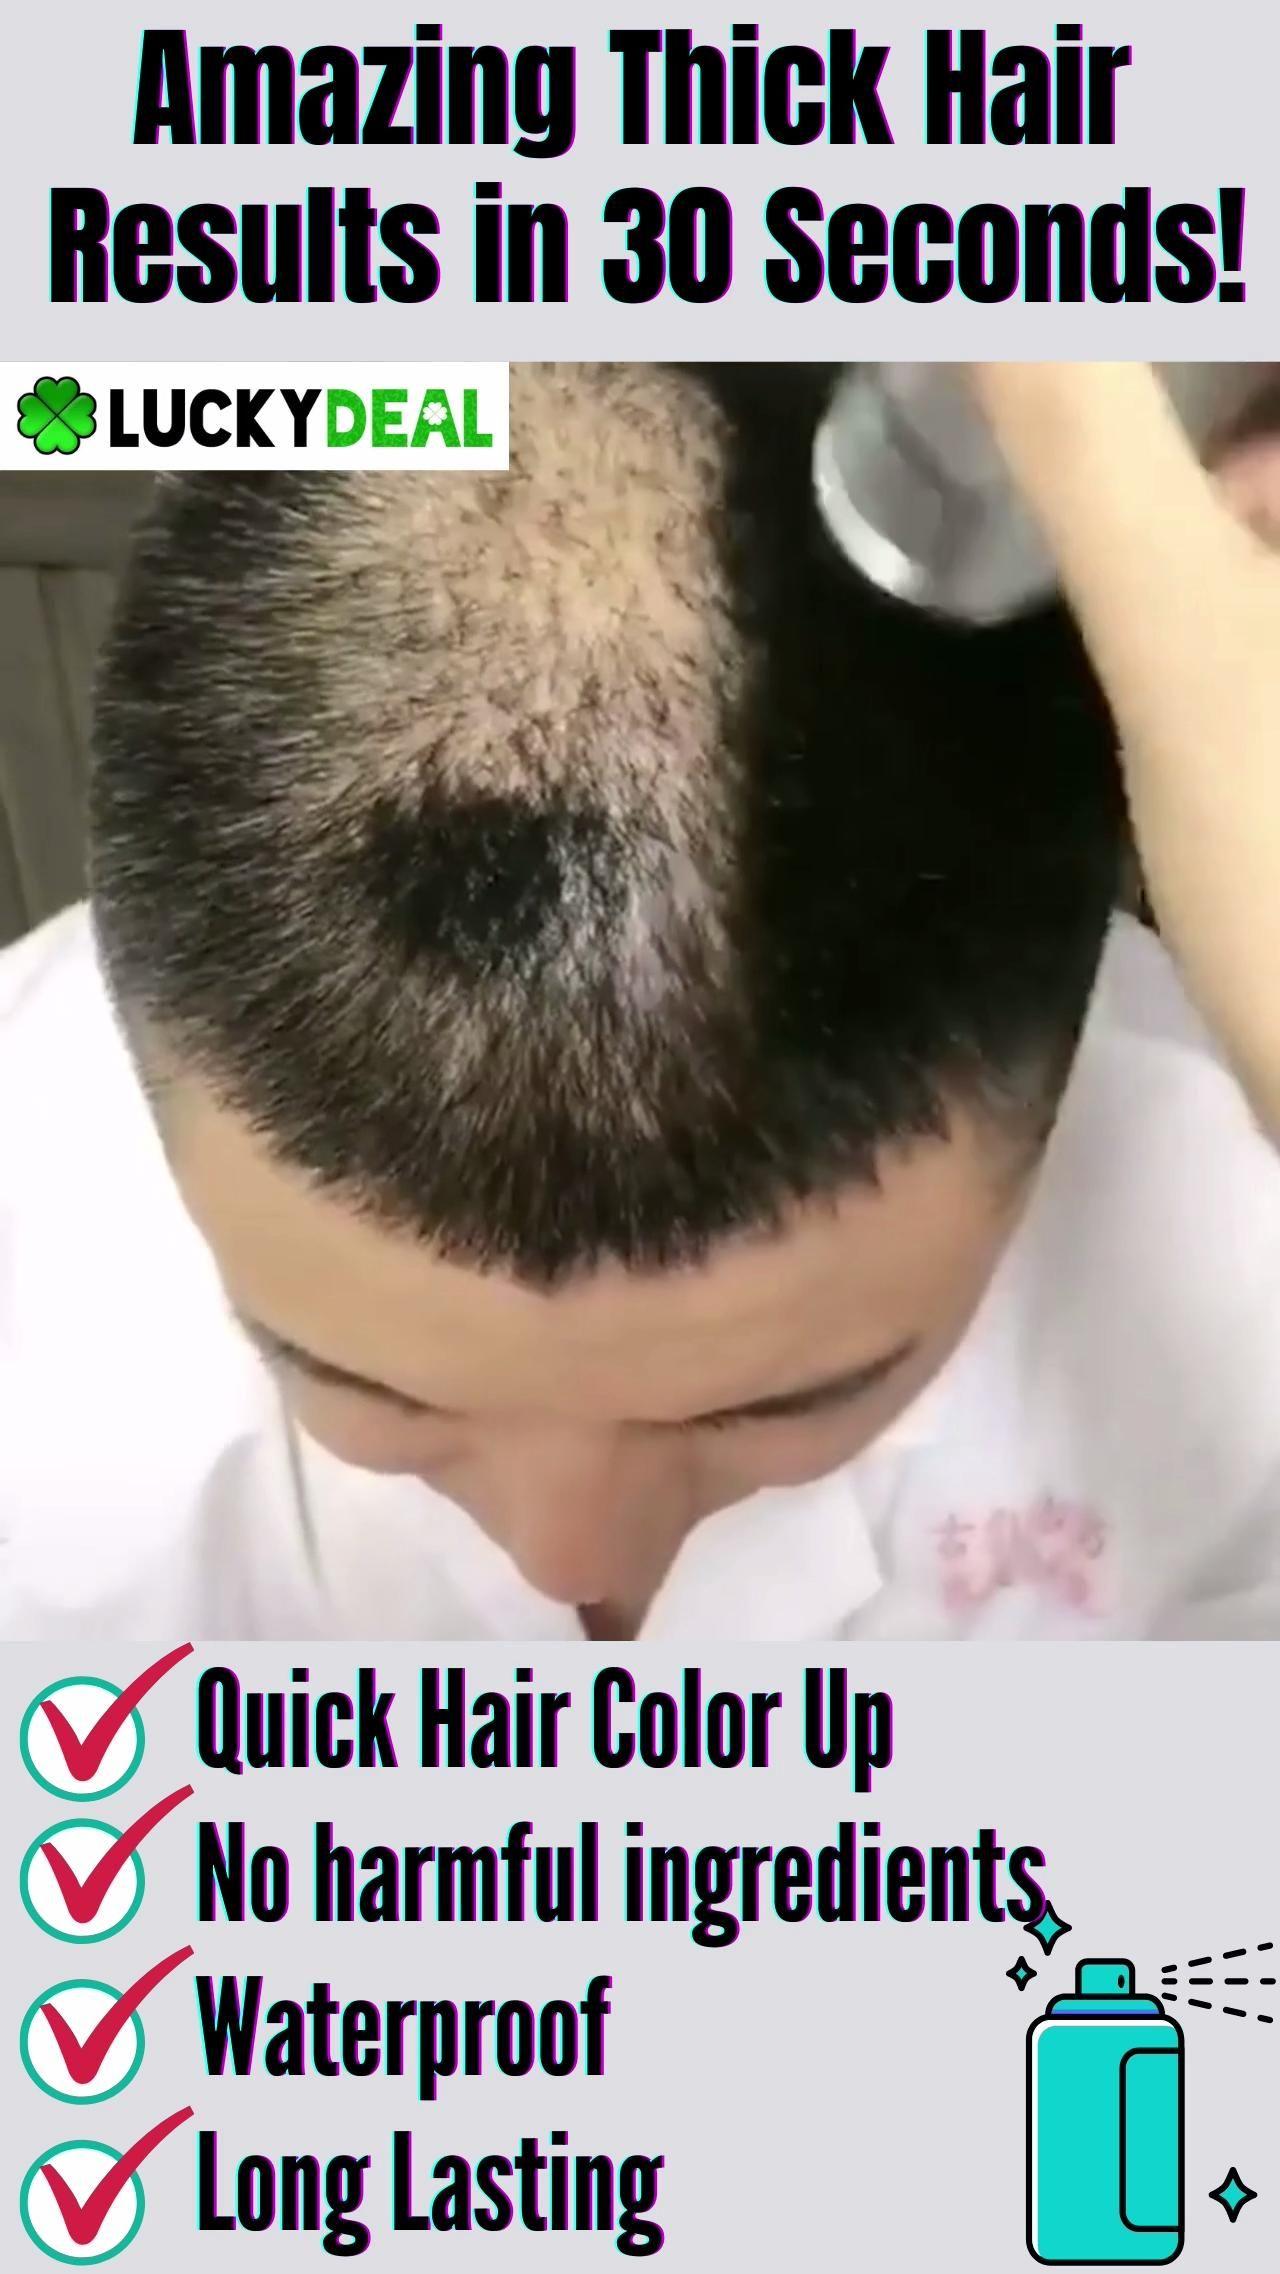 😱World's Best Selling Hair Building Fibers!🌎